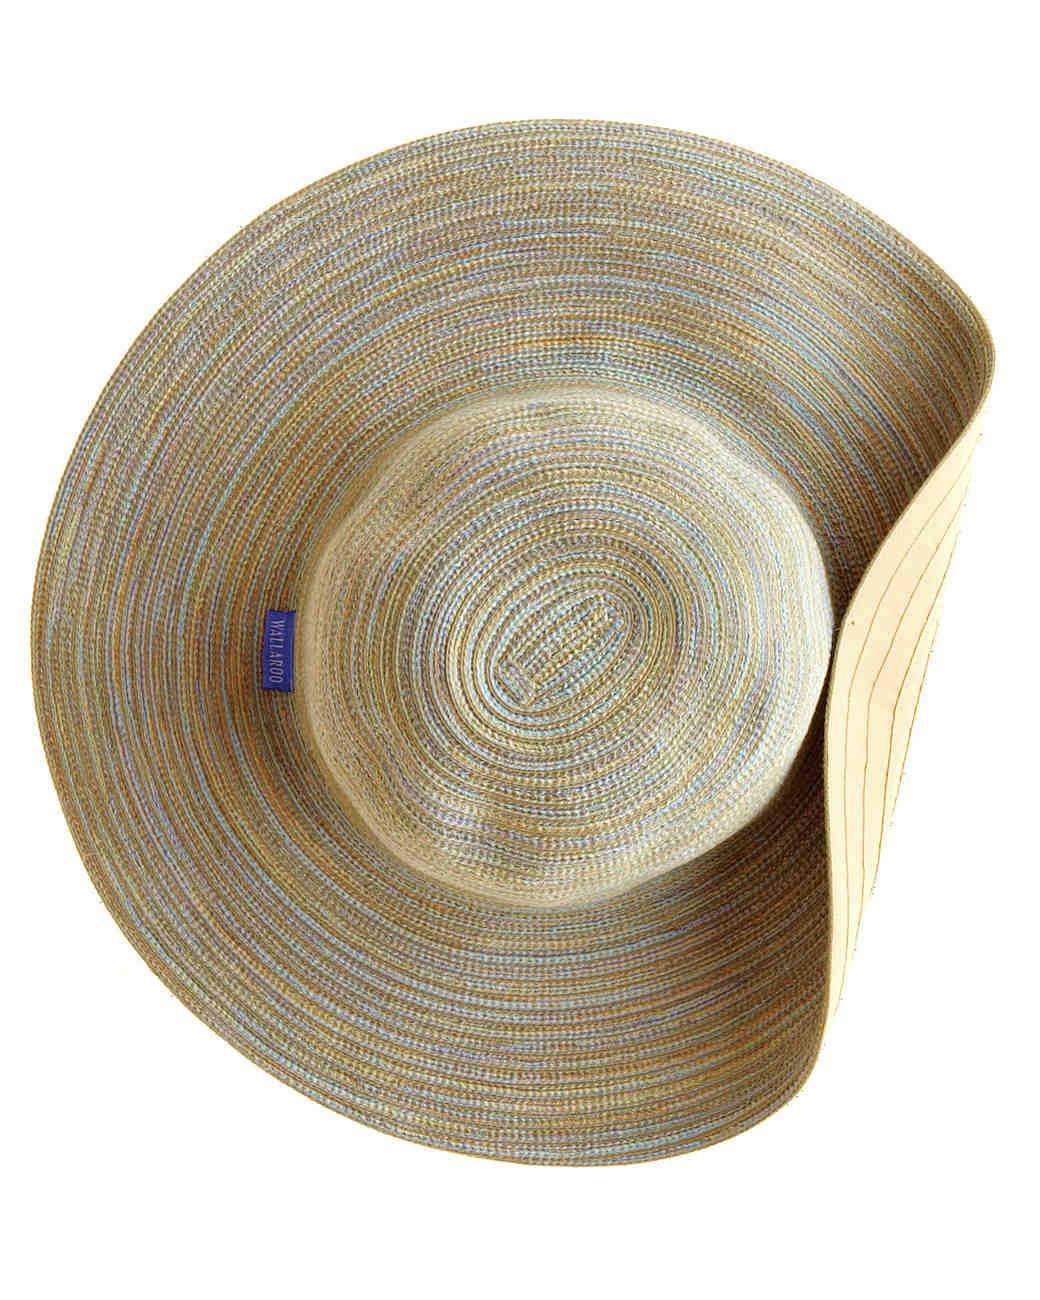 travel-accessories-hat-mwd107604.jpg